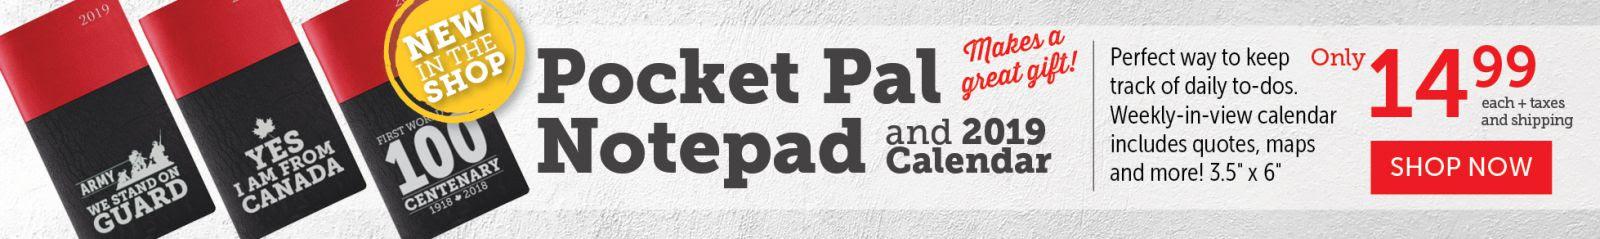 Pocket Pal Notepad and 2019 Calendar